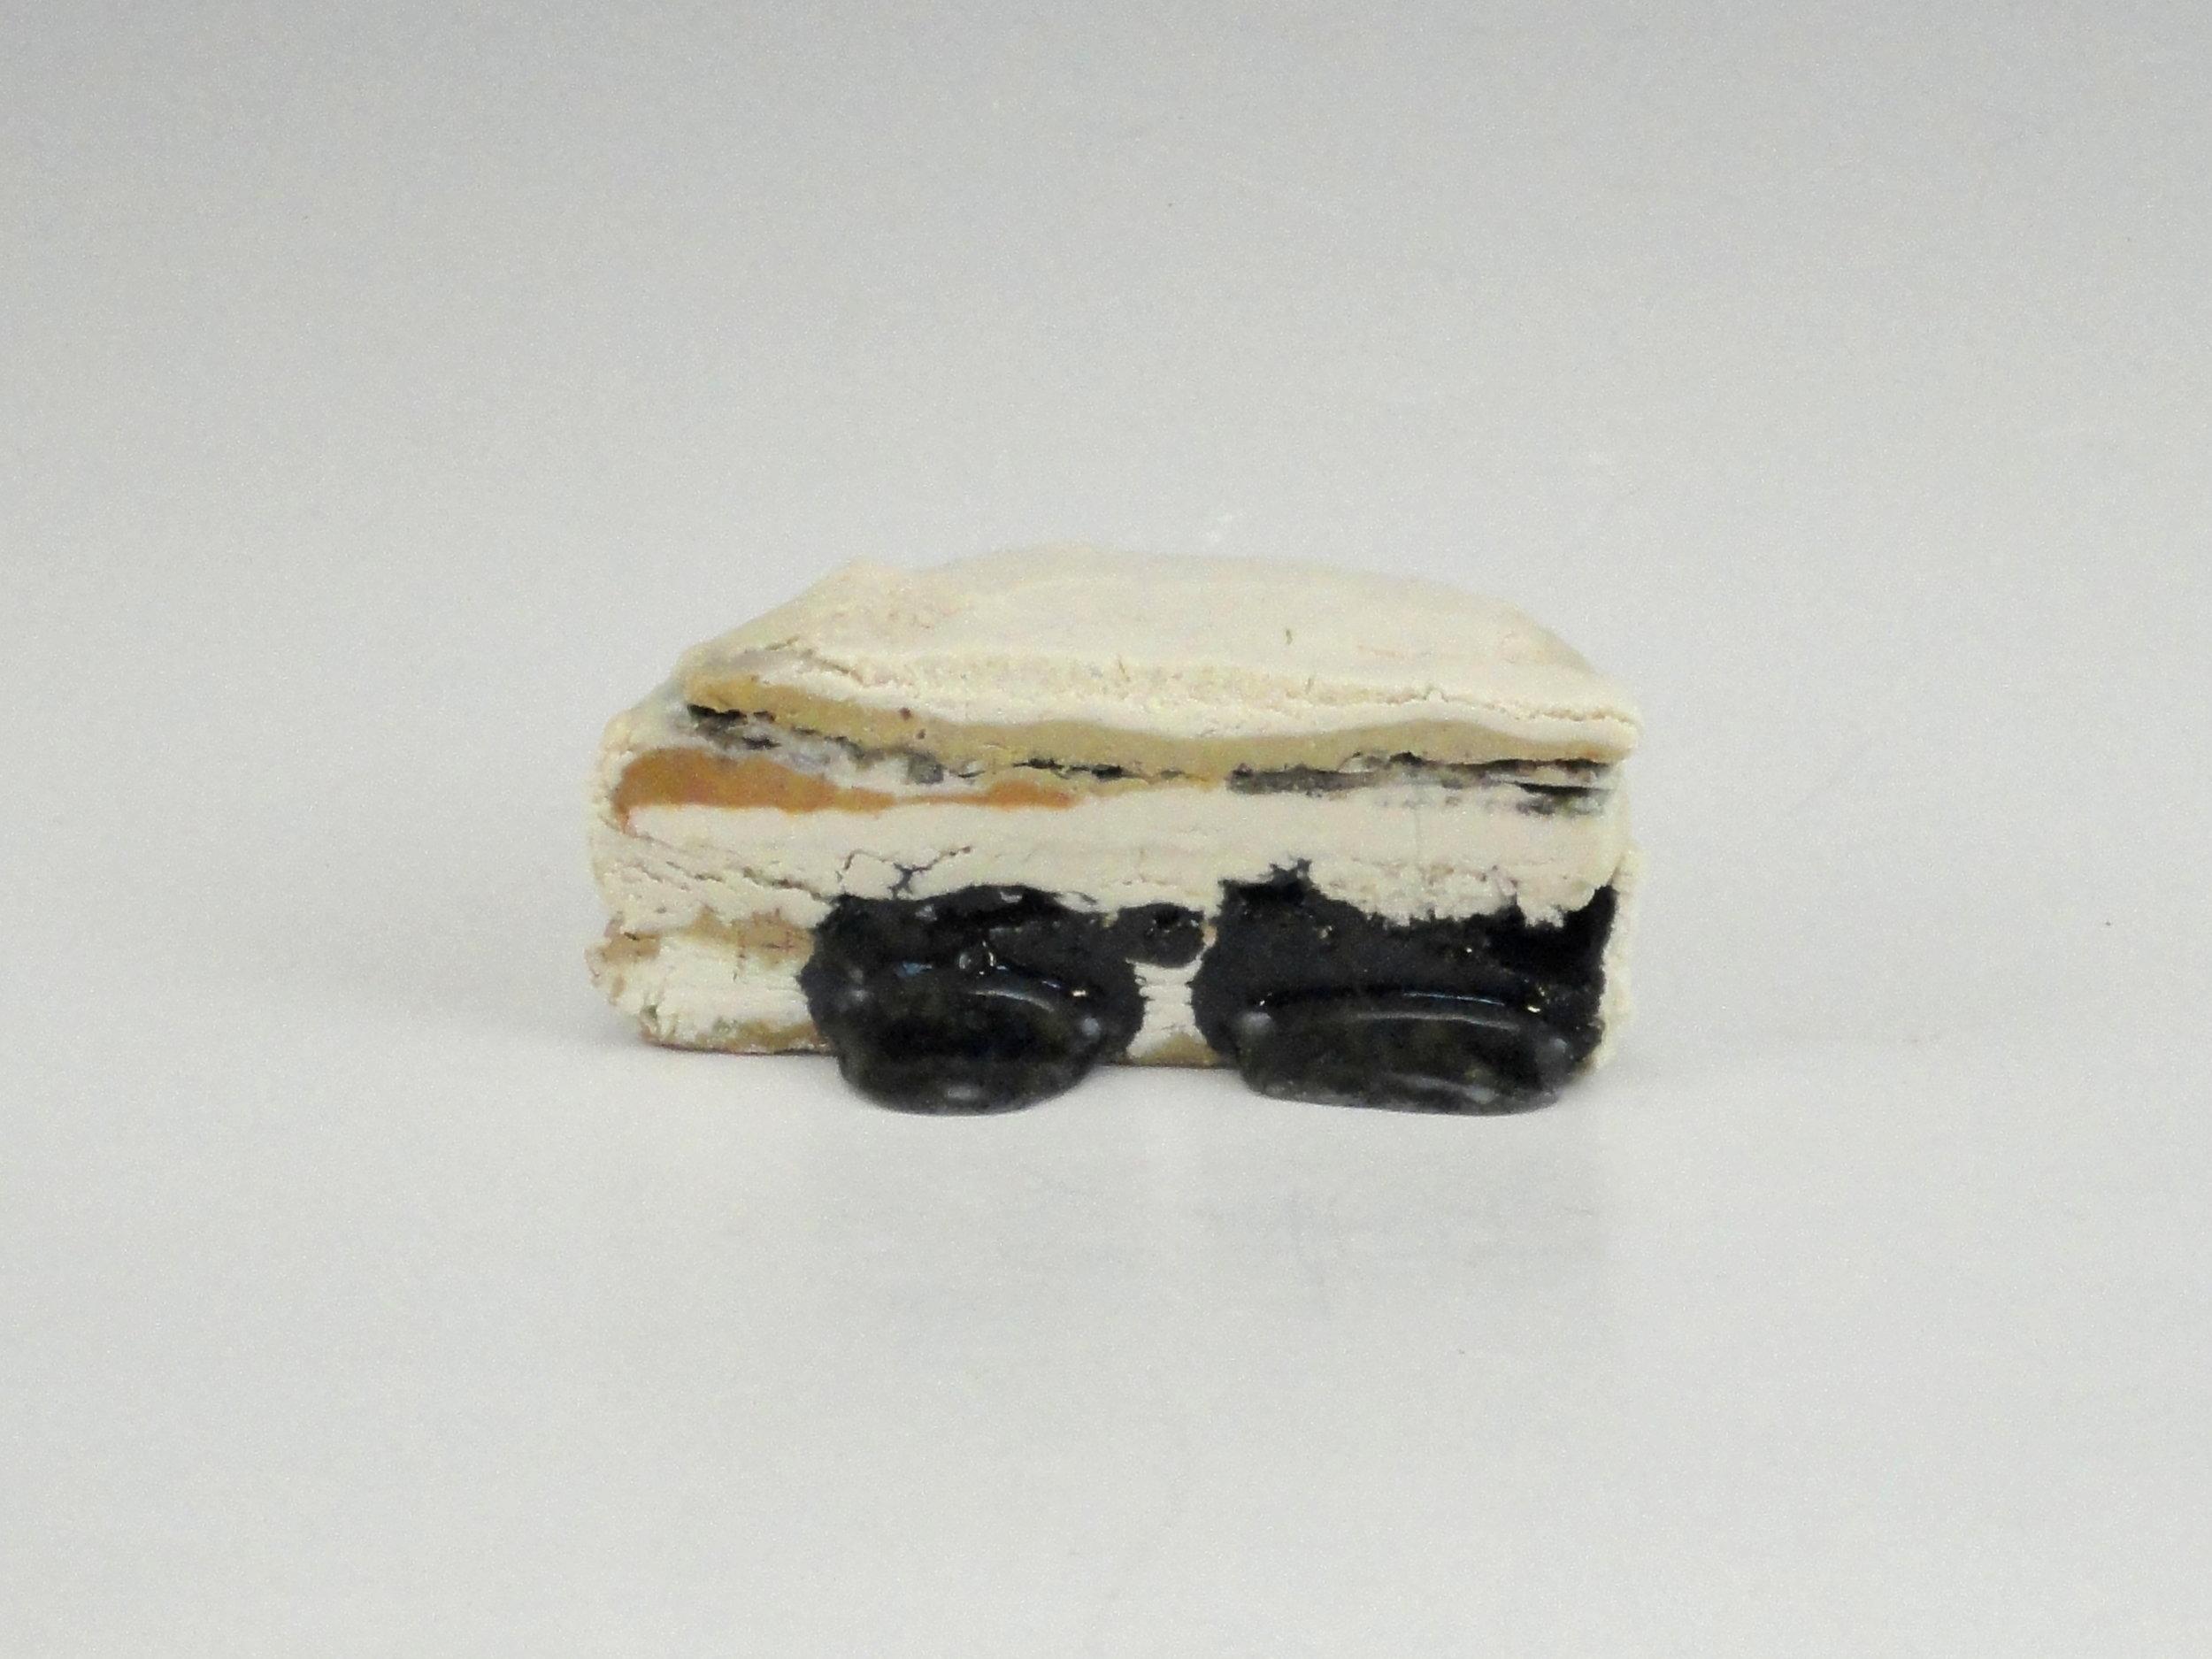 Oil Sands Layer Cake, half